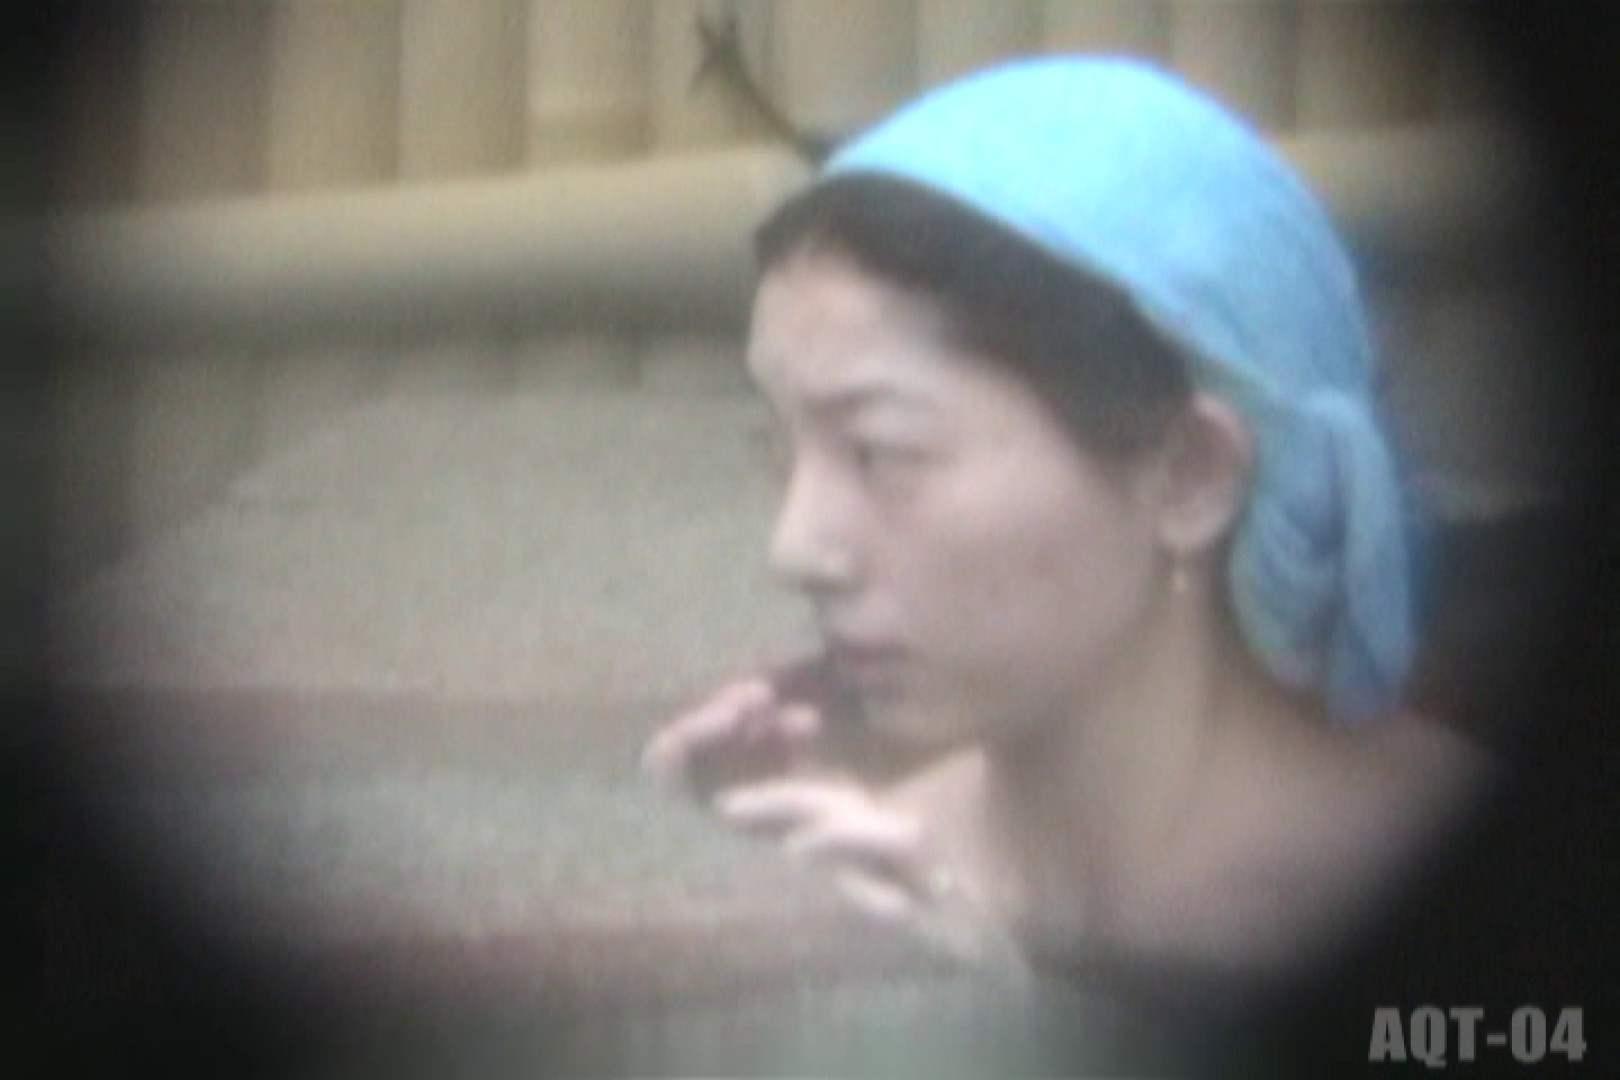 Aquaな露天風呂Vol.742 盗撮特撮 | OLのプライベート  10pic 1